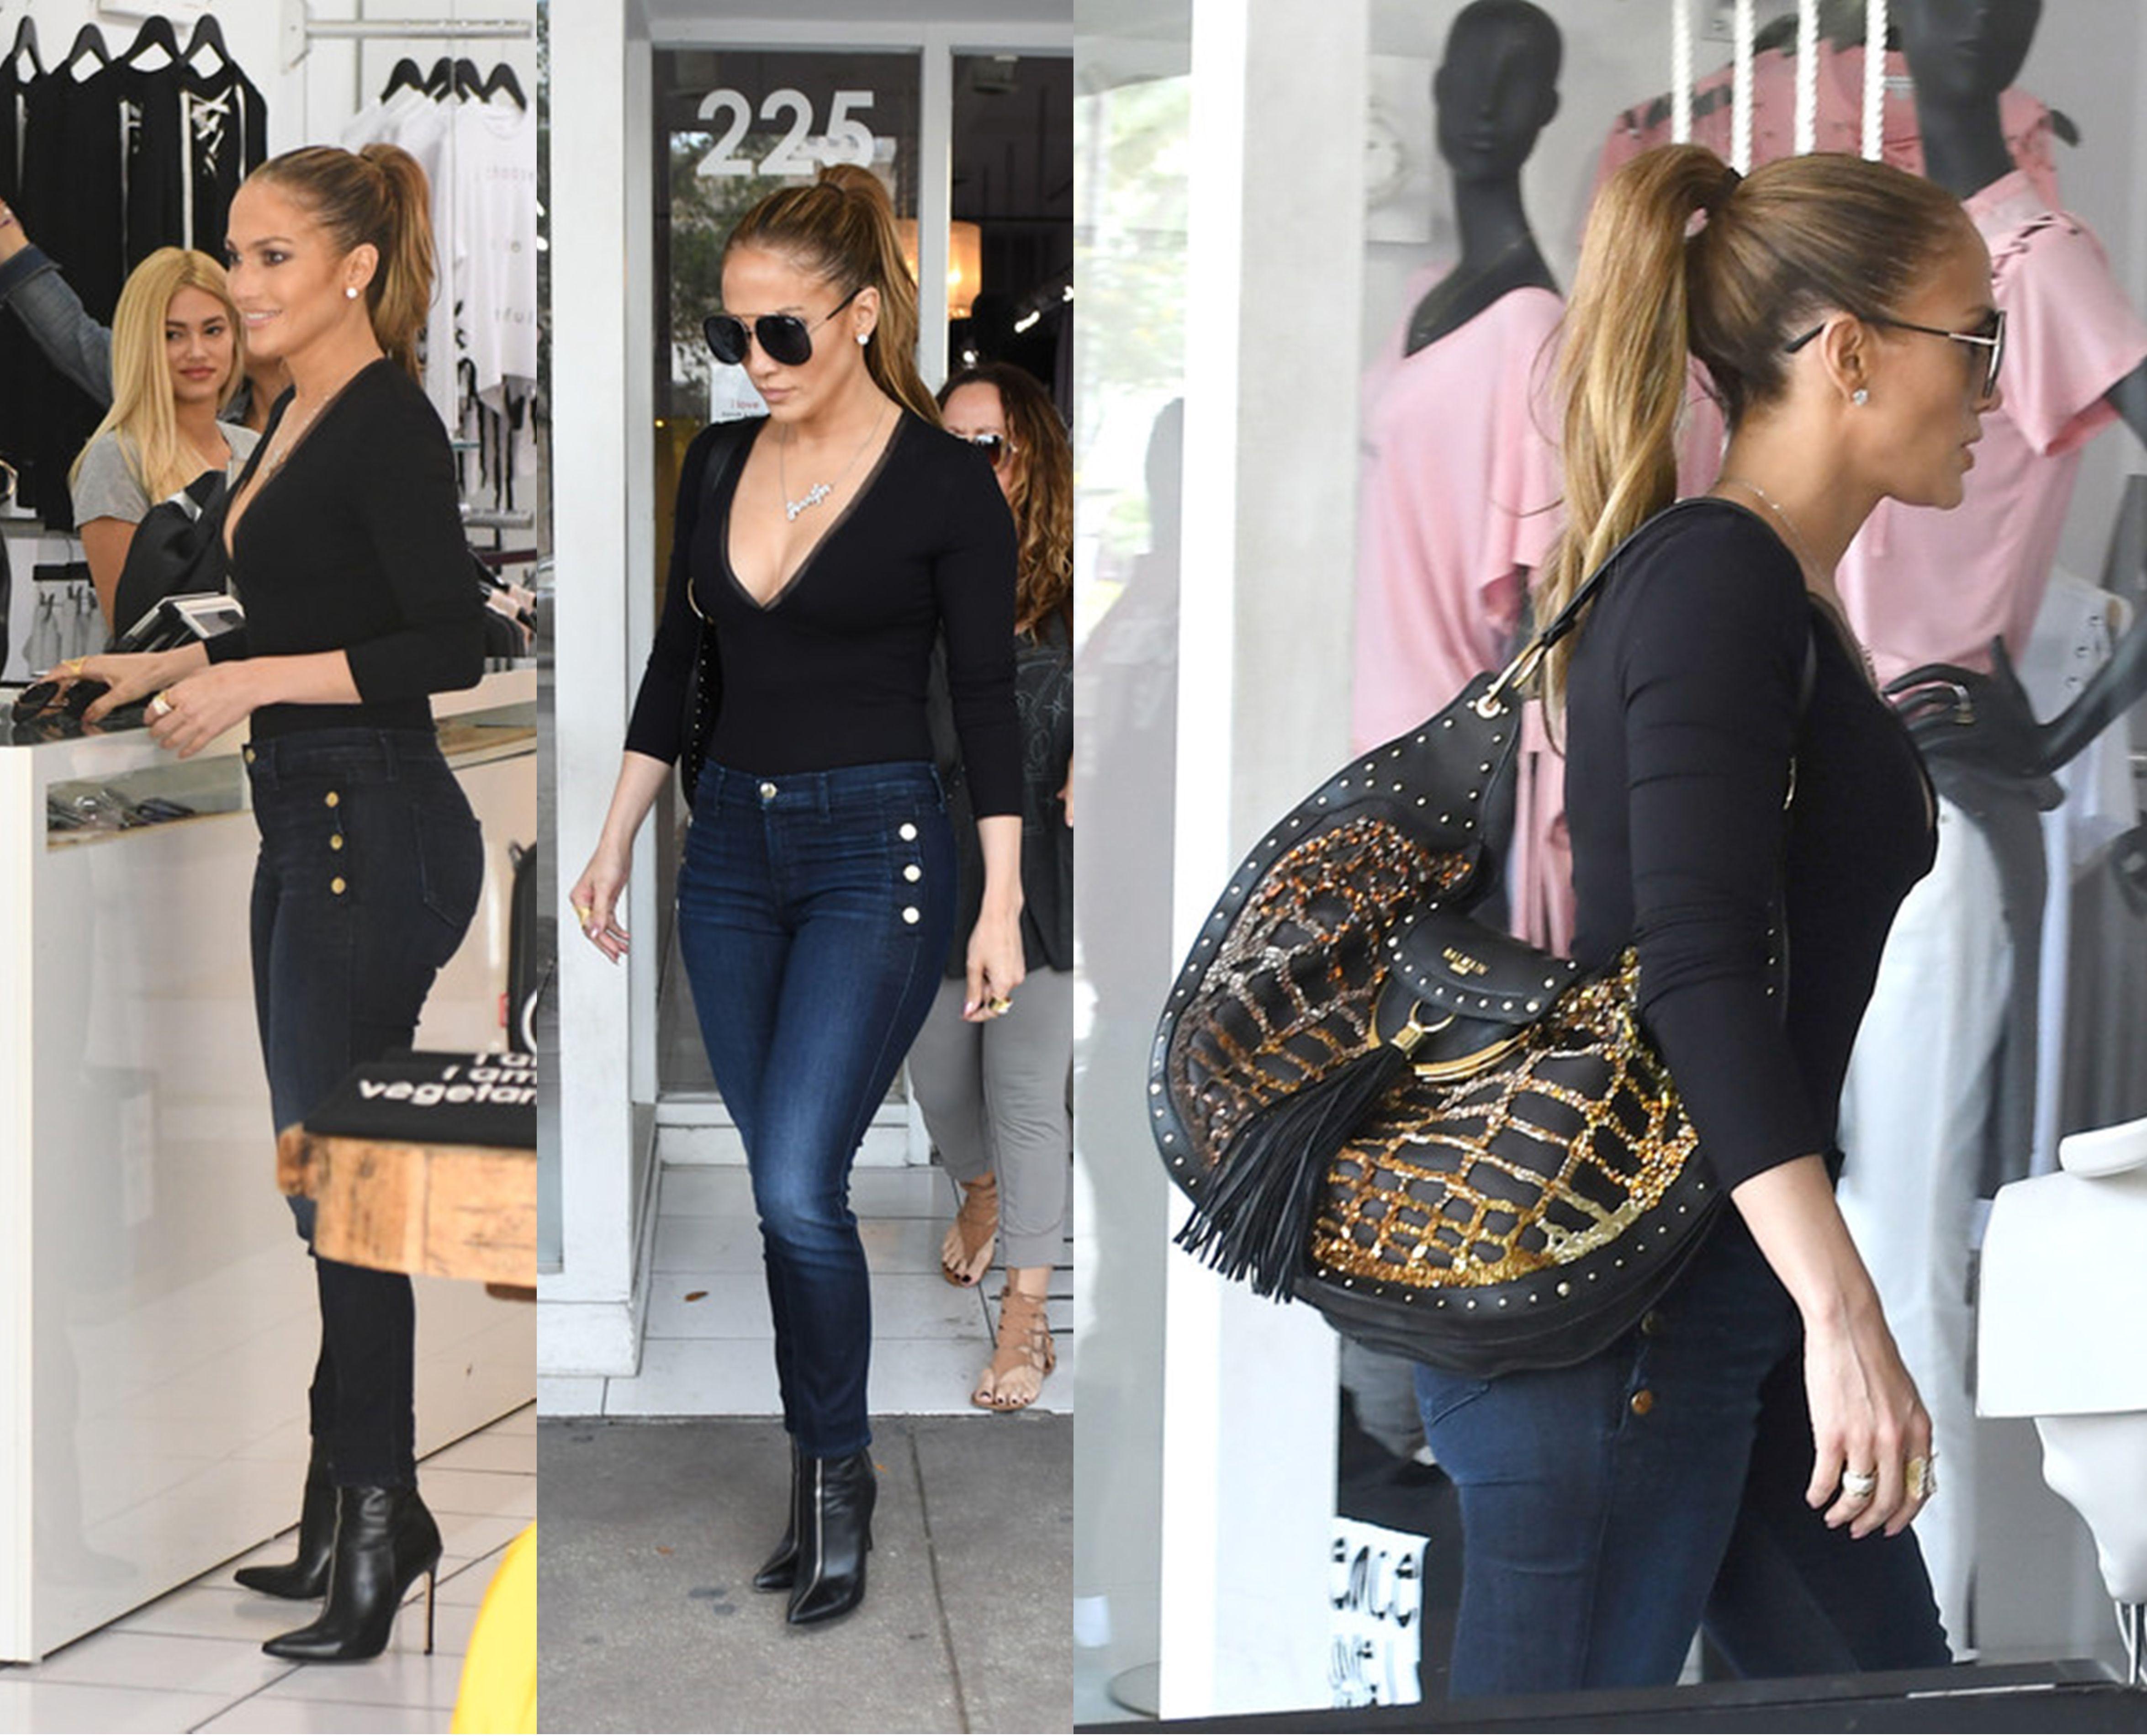 Angelina Muniz Nova jennifer lopez- streetstyle | fashion, jennifer lopez, outfits